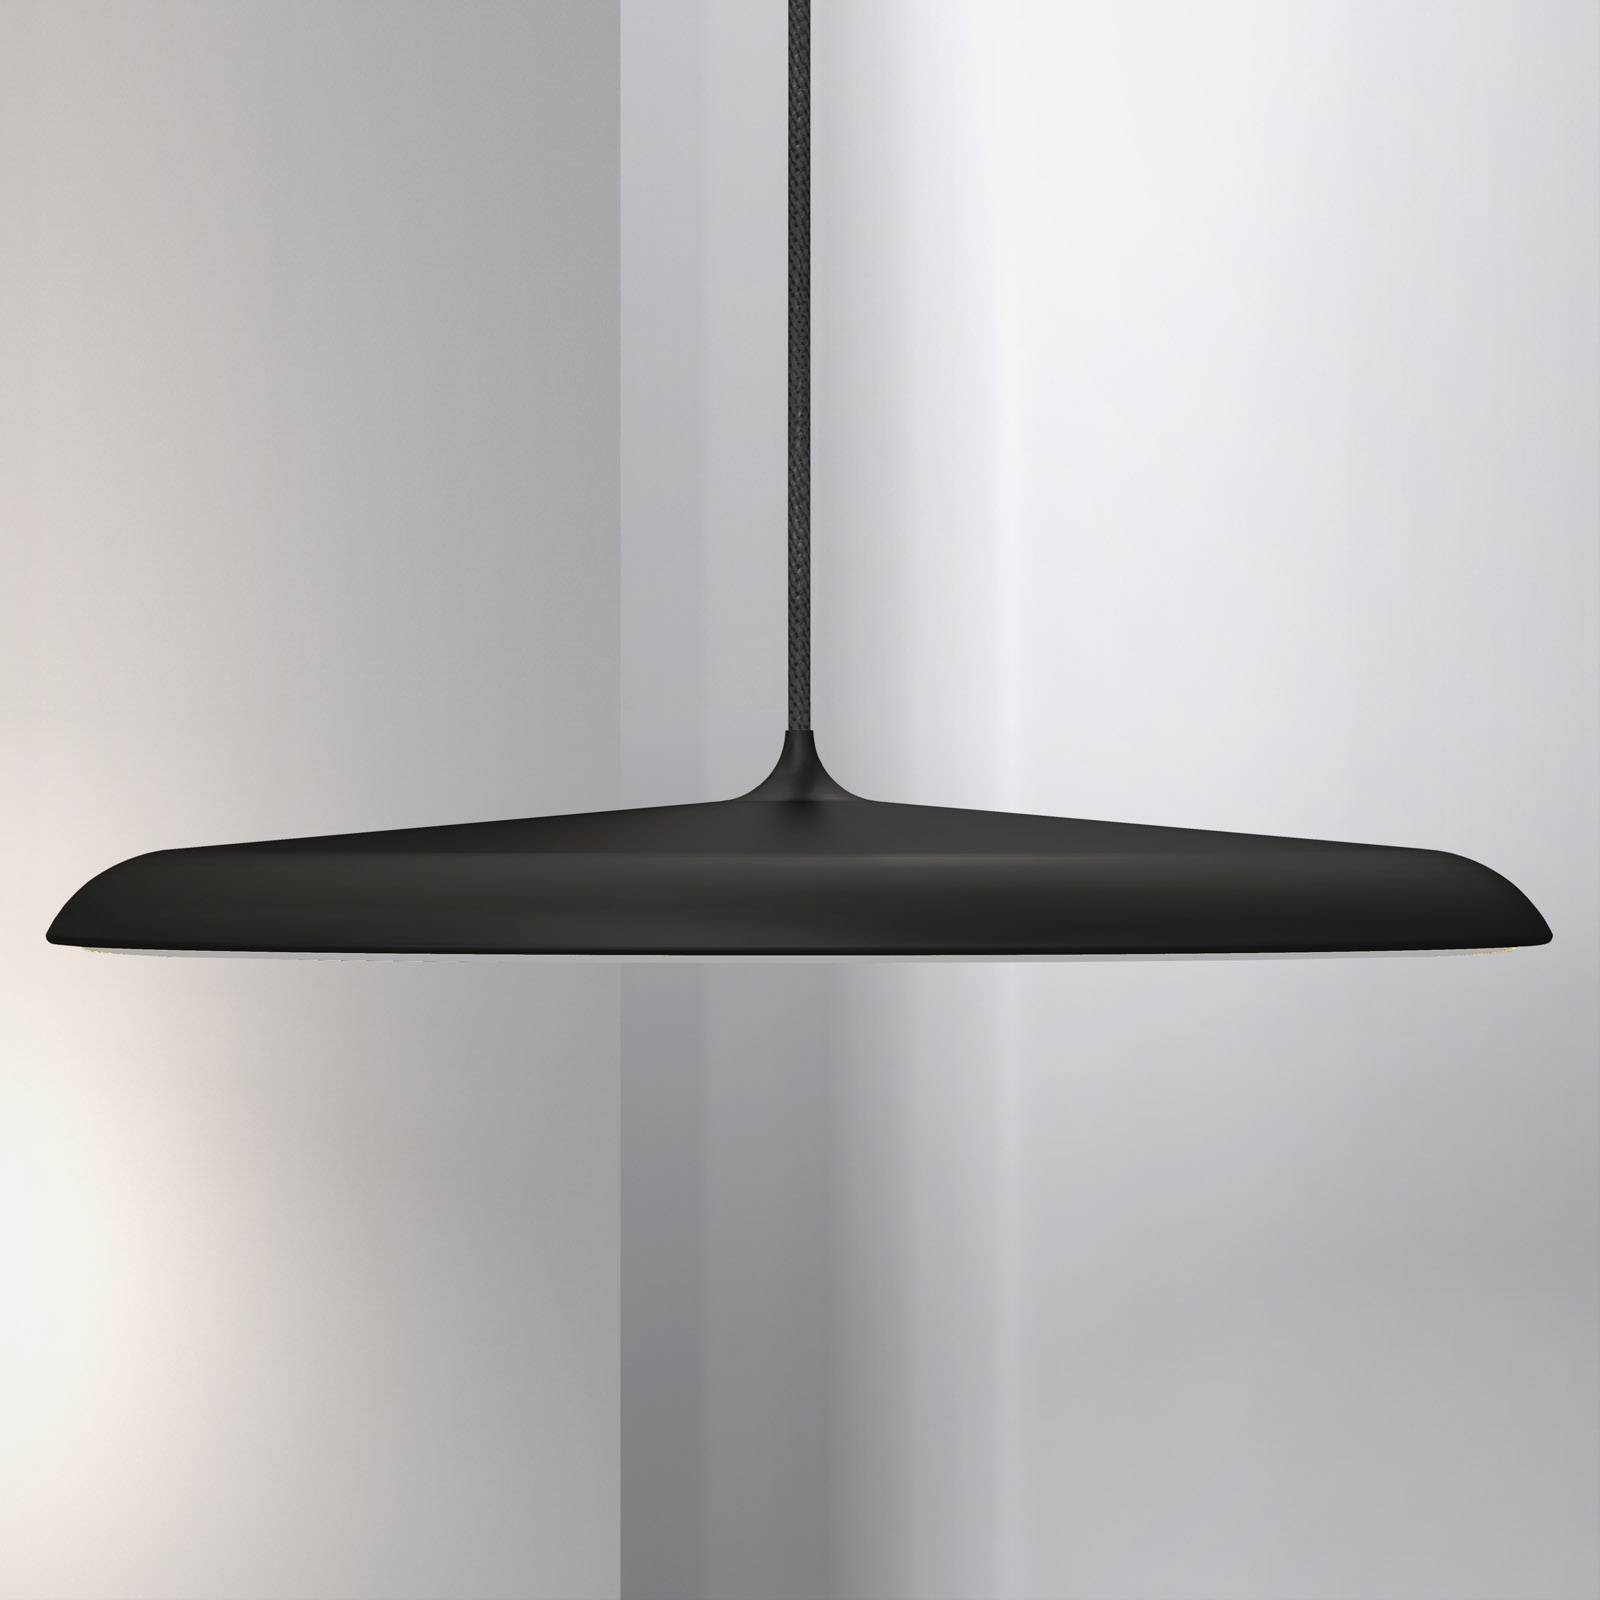 LED-riippuvalaisin Artist, Ø 40 cm, musta